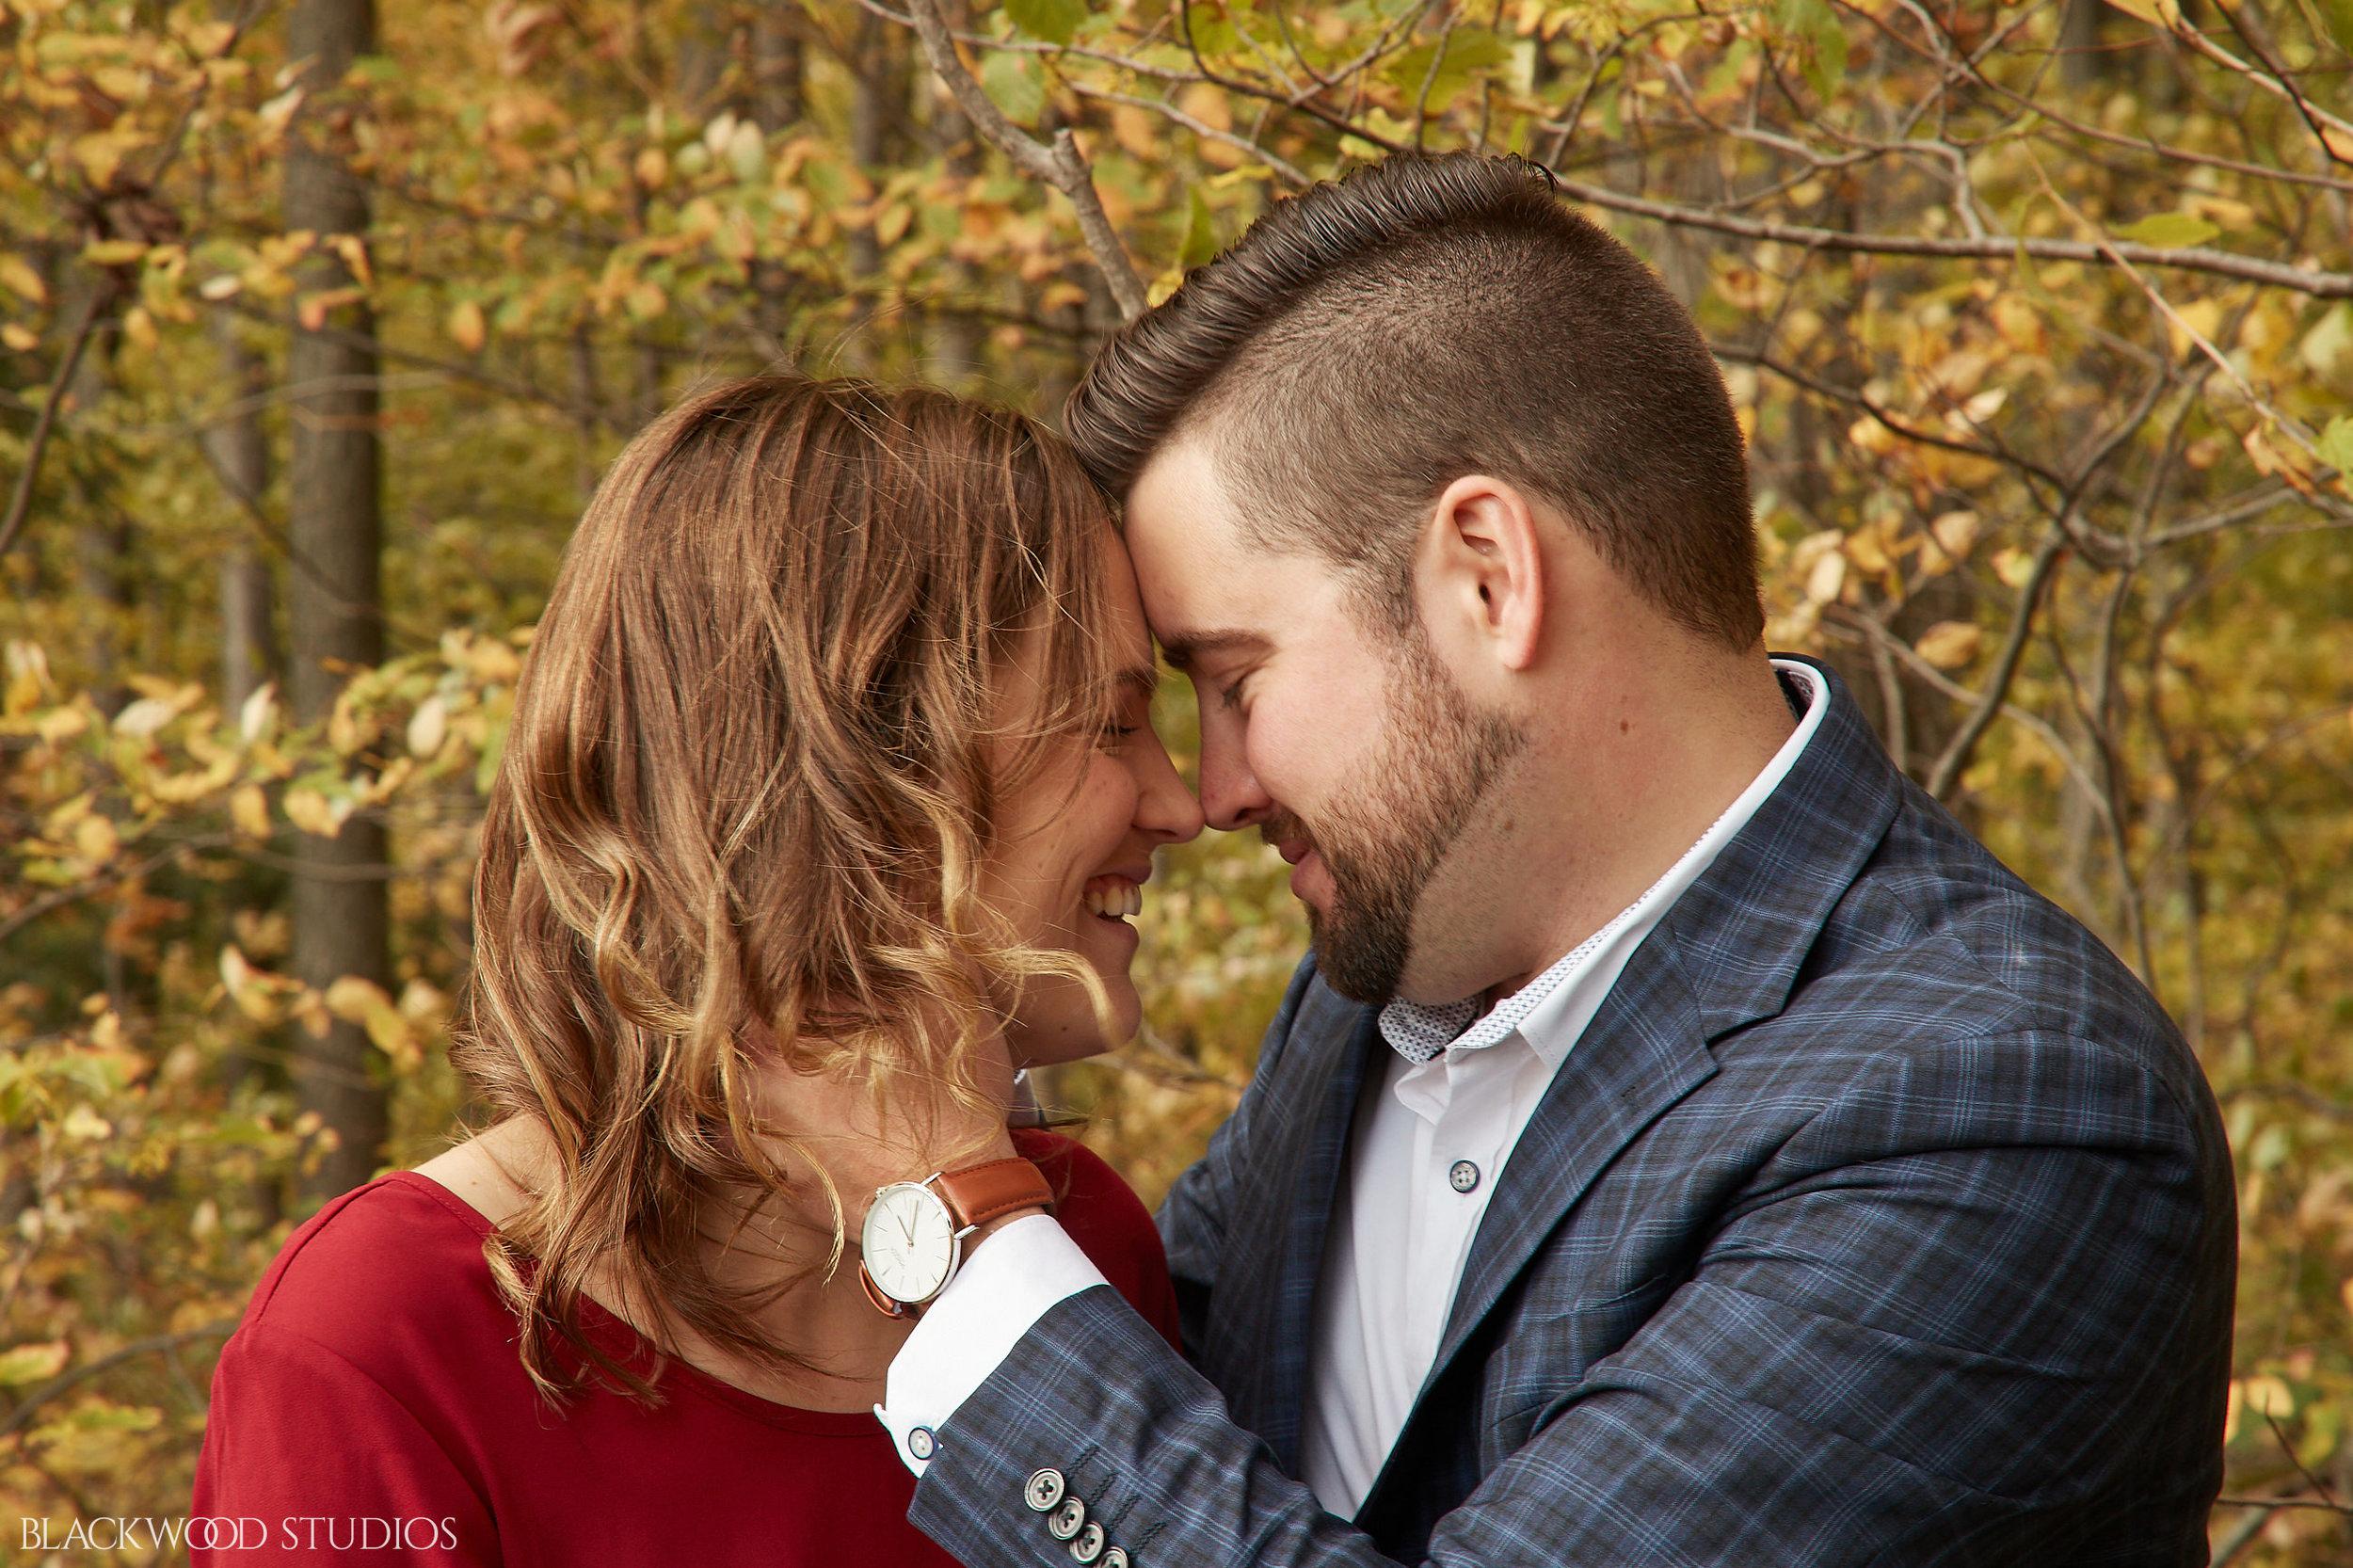 Blackwood-Studios-20181014-153456-Dave-and-Natalie-Engagement-0334-Rattlesnake-Point-Conservation-Area-Milton-Ontario.jpg